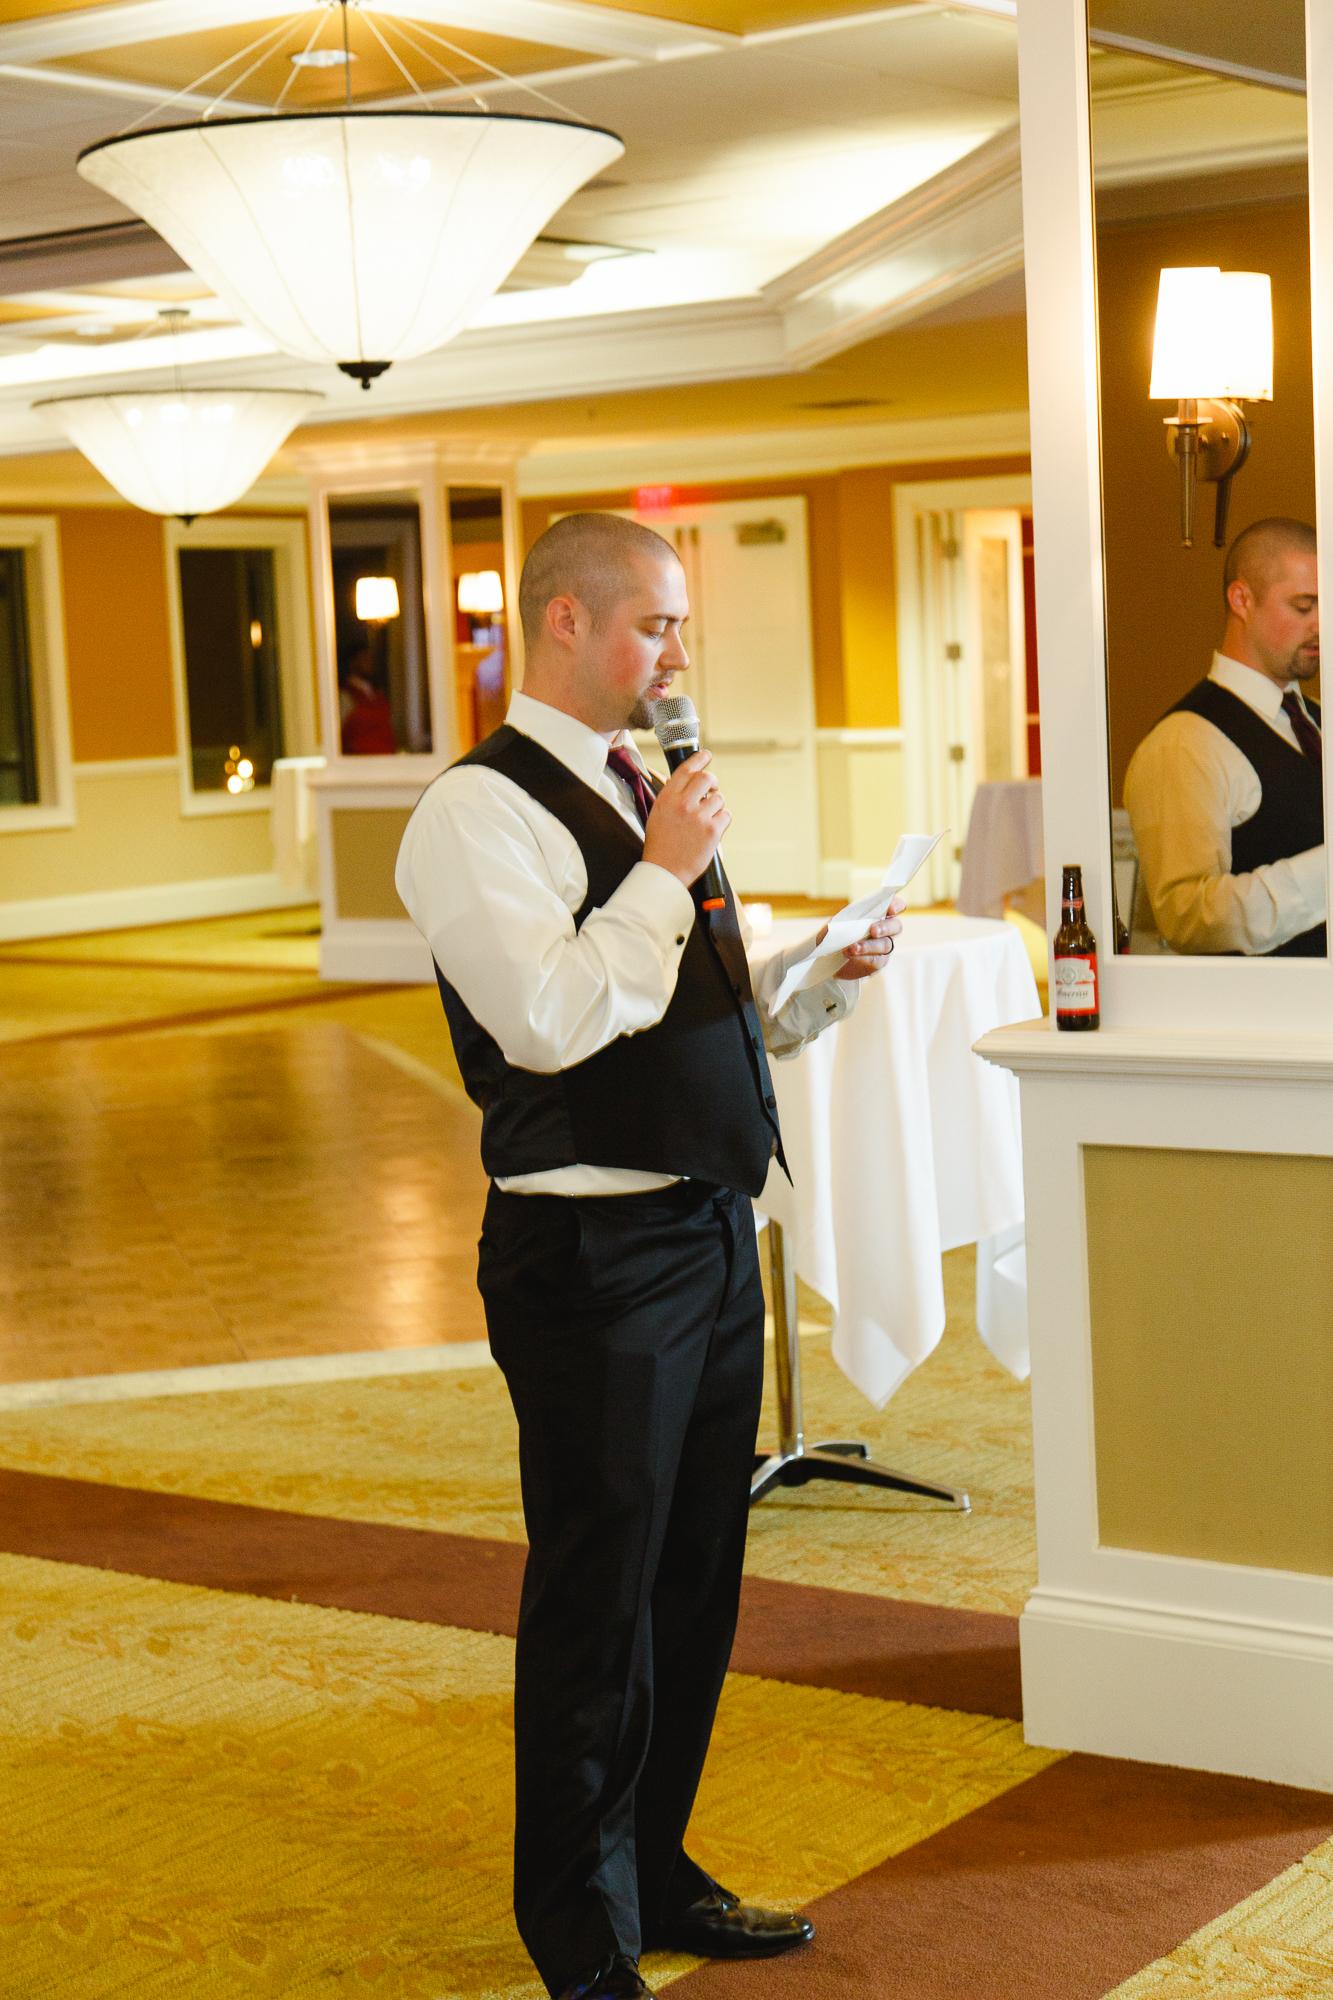 brady-cake-speeches-ceremony-a-ohio-lighting-ocf-columbus-wedding-couple-bridal-creekside-conference-indoor-roxanna-sue-photos-ohio-photography-1.jpg